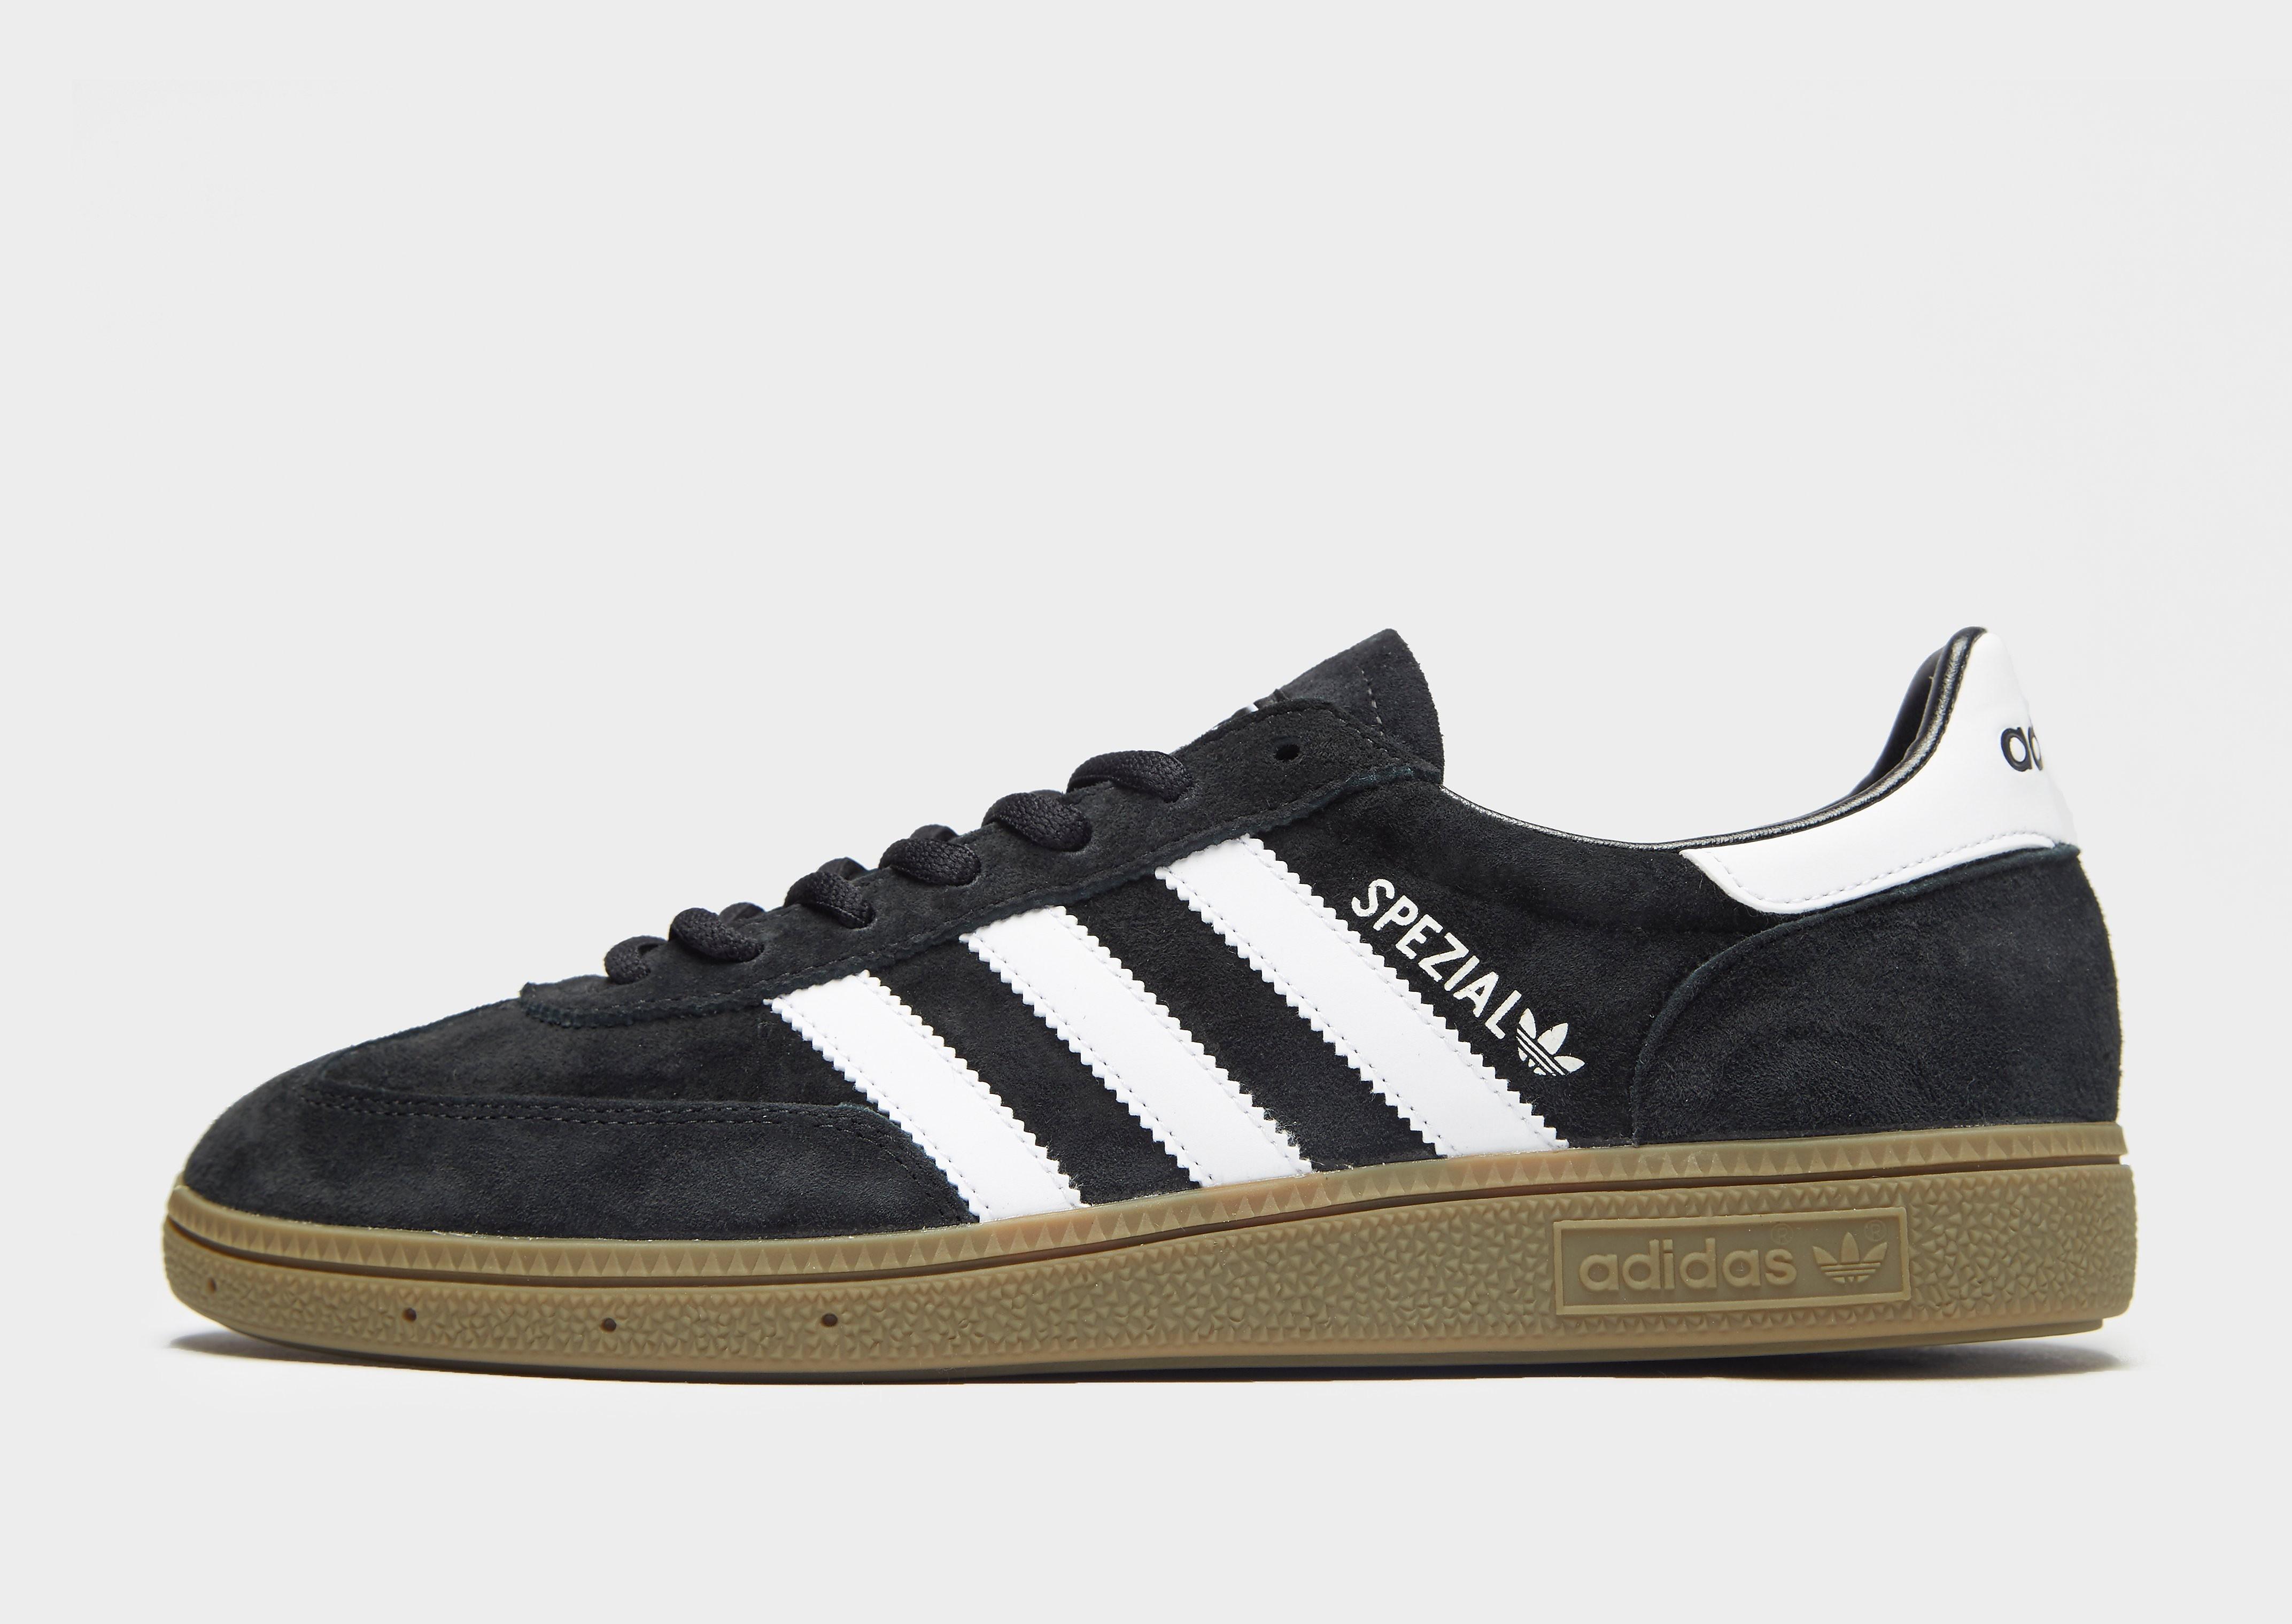 Adidas Spezial herensneaker zwart en goud